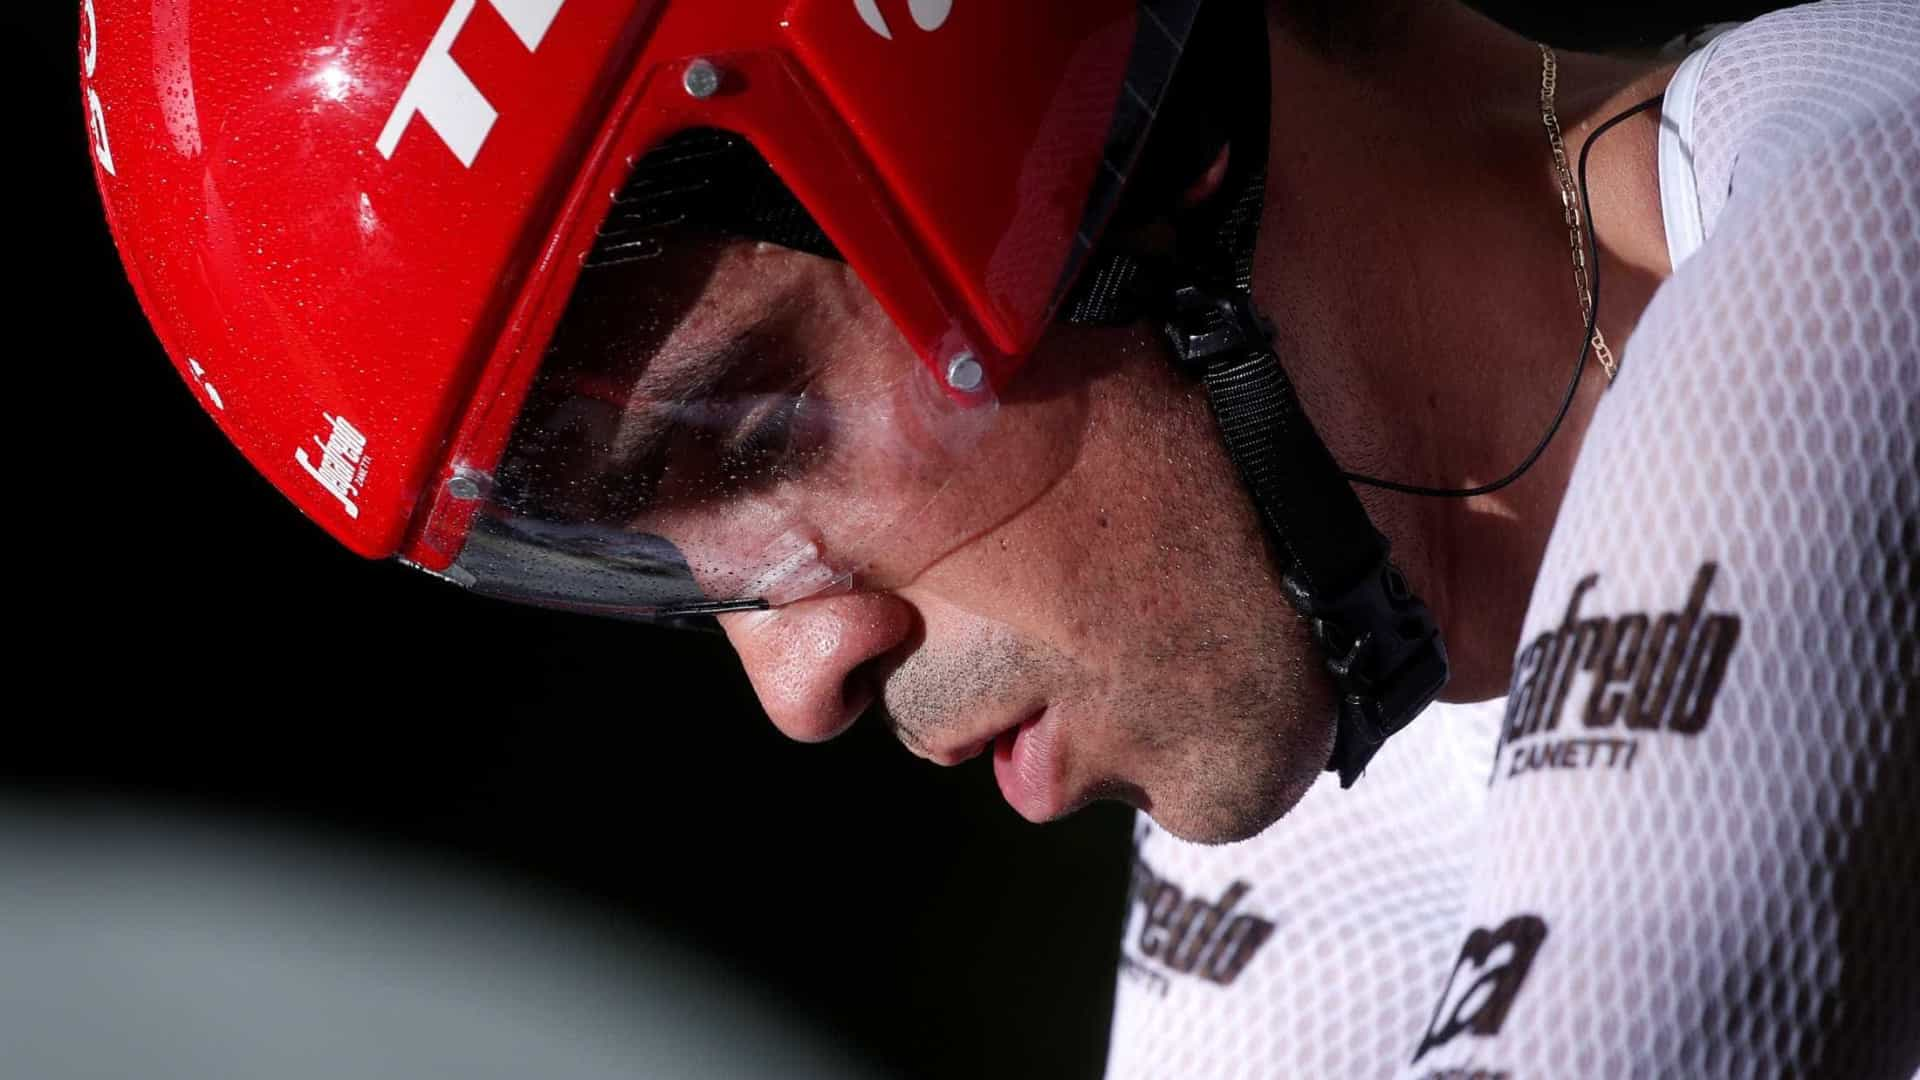 Desta vez é que é: Alberto Contador retira-se depois da Vuelta